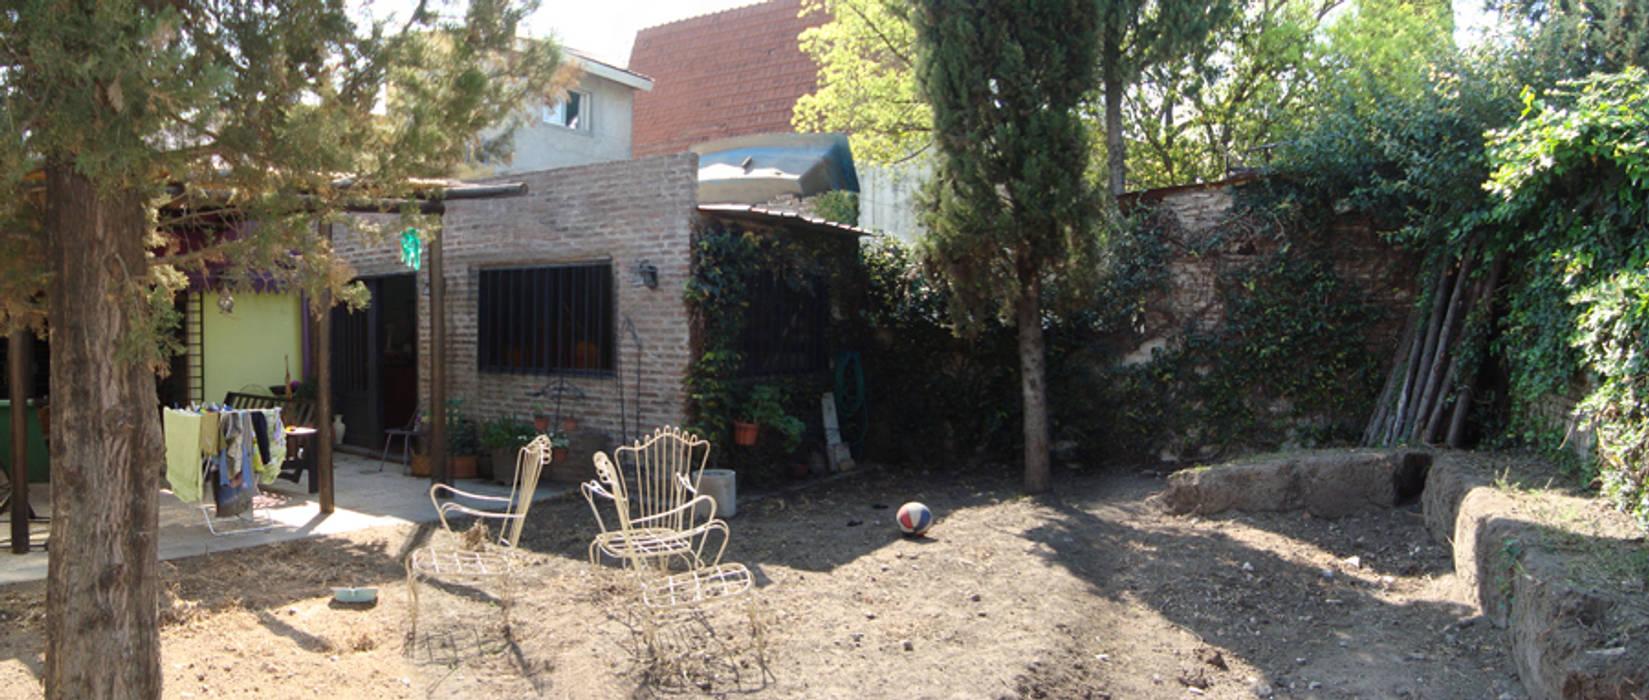 ELVARQUITECTOS 庭院遮陽棚 木頭